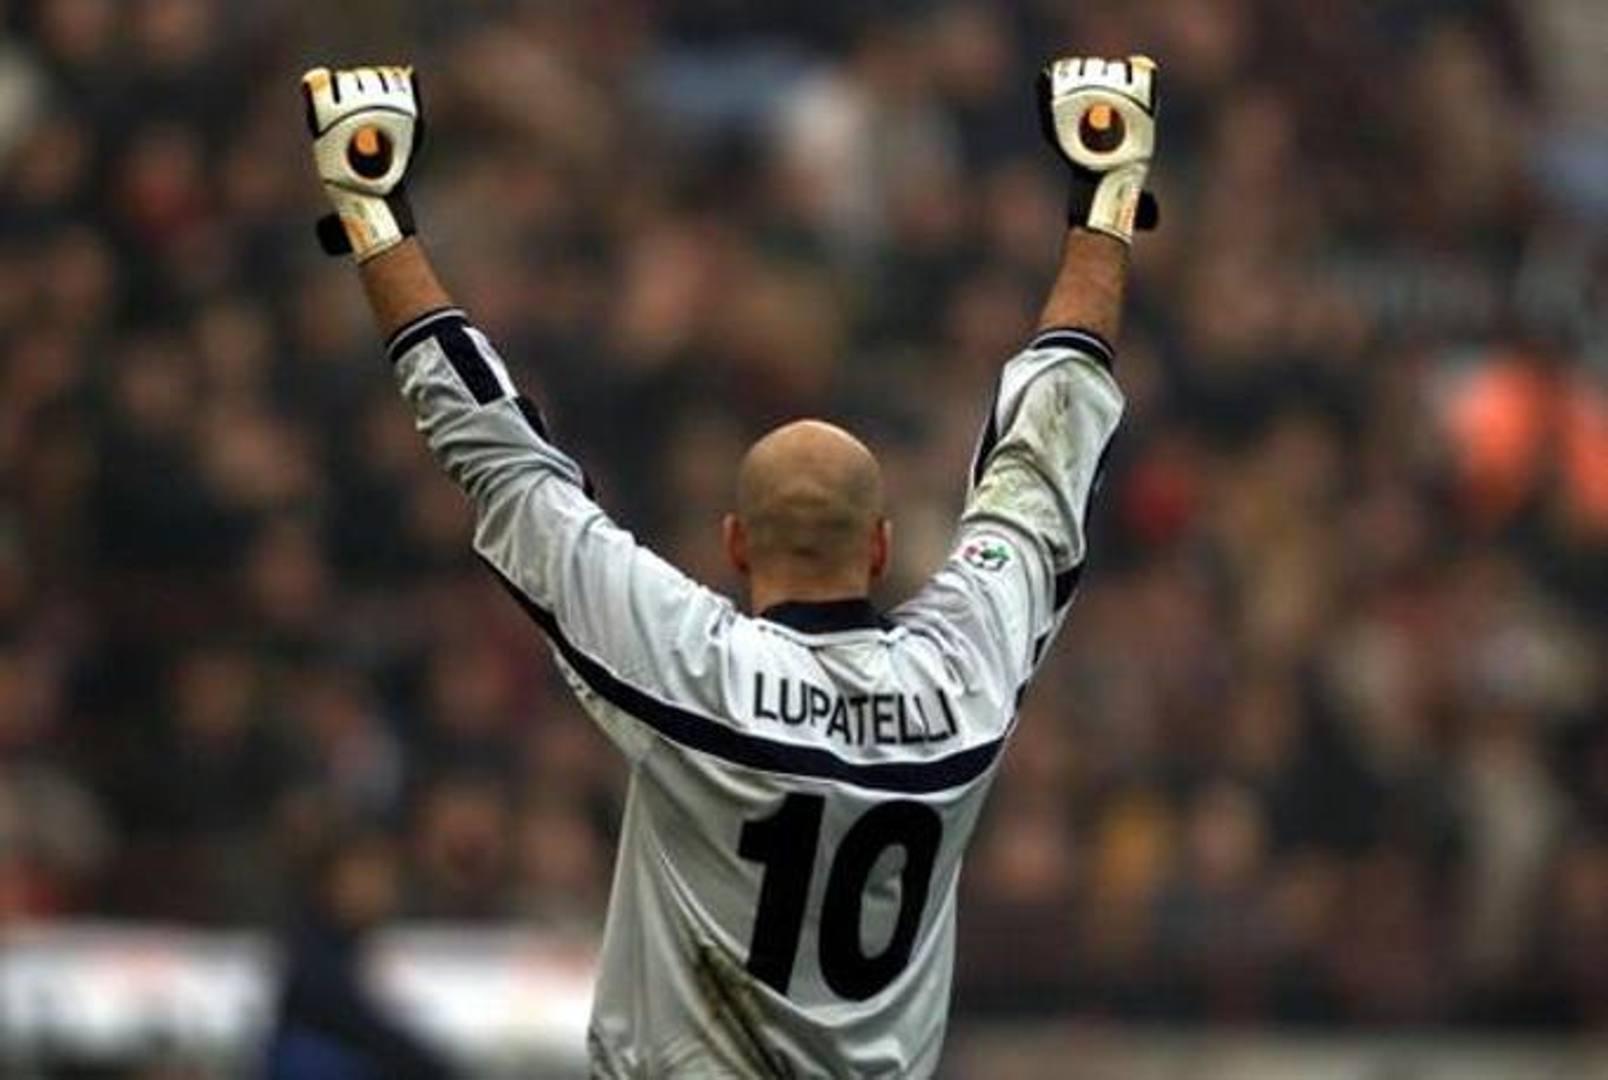 Lupatelli-10.jpg